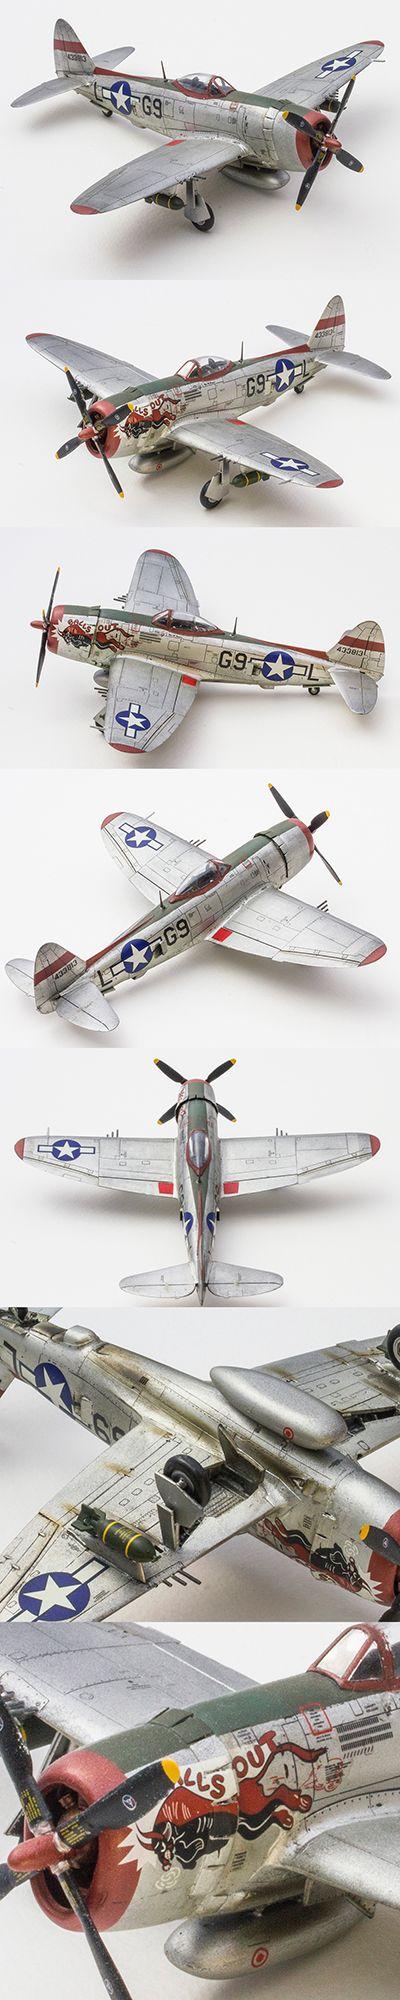 P-47 Thunderbolt 1/72 Scale by Korhan AKBAYTOGAN